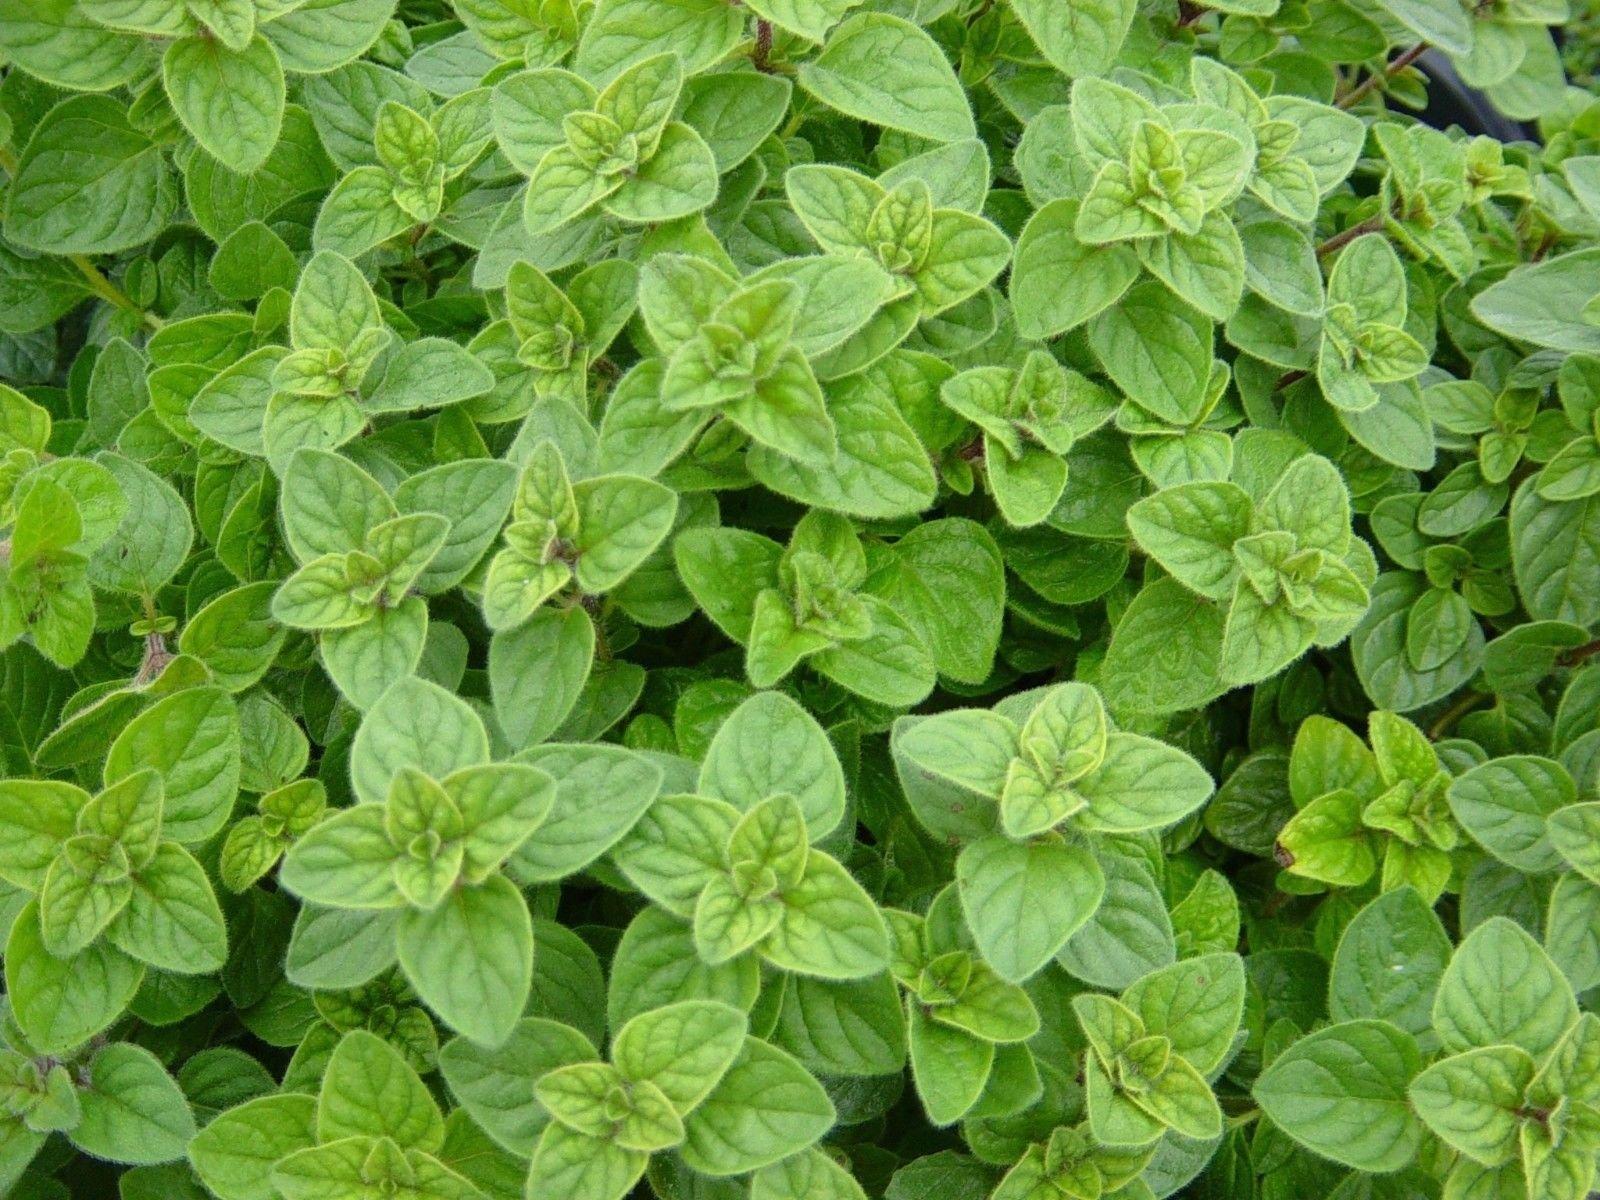 Greek Oregano, Winter Marjoram, Herb, Non-GMO, Variety Sizes,